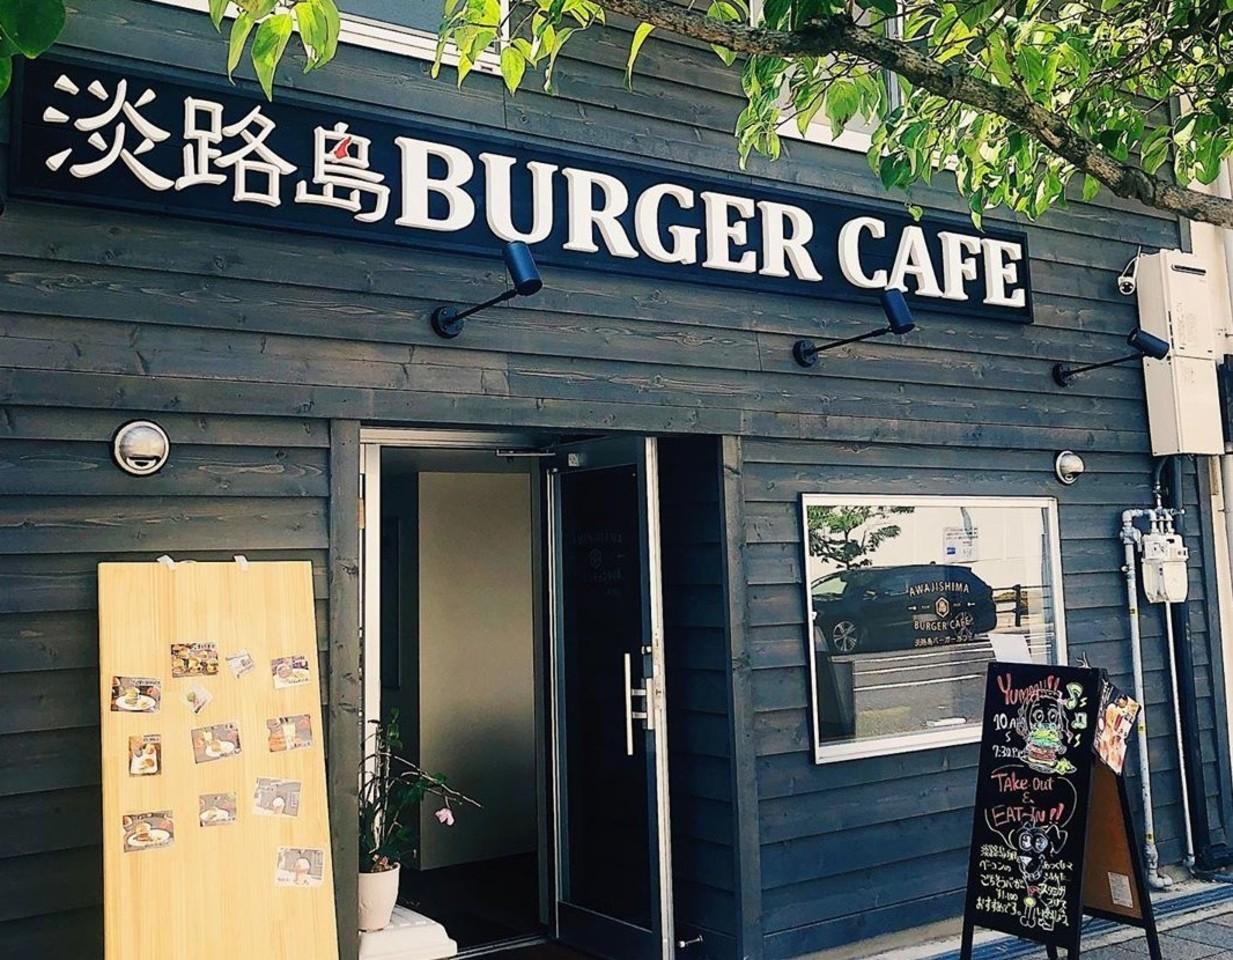 絶品!淡路島BURGER...兵庫県神戸市東灘区御影本町4丁目の「淡路島バーガーカフェ」